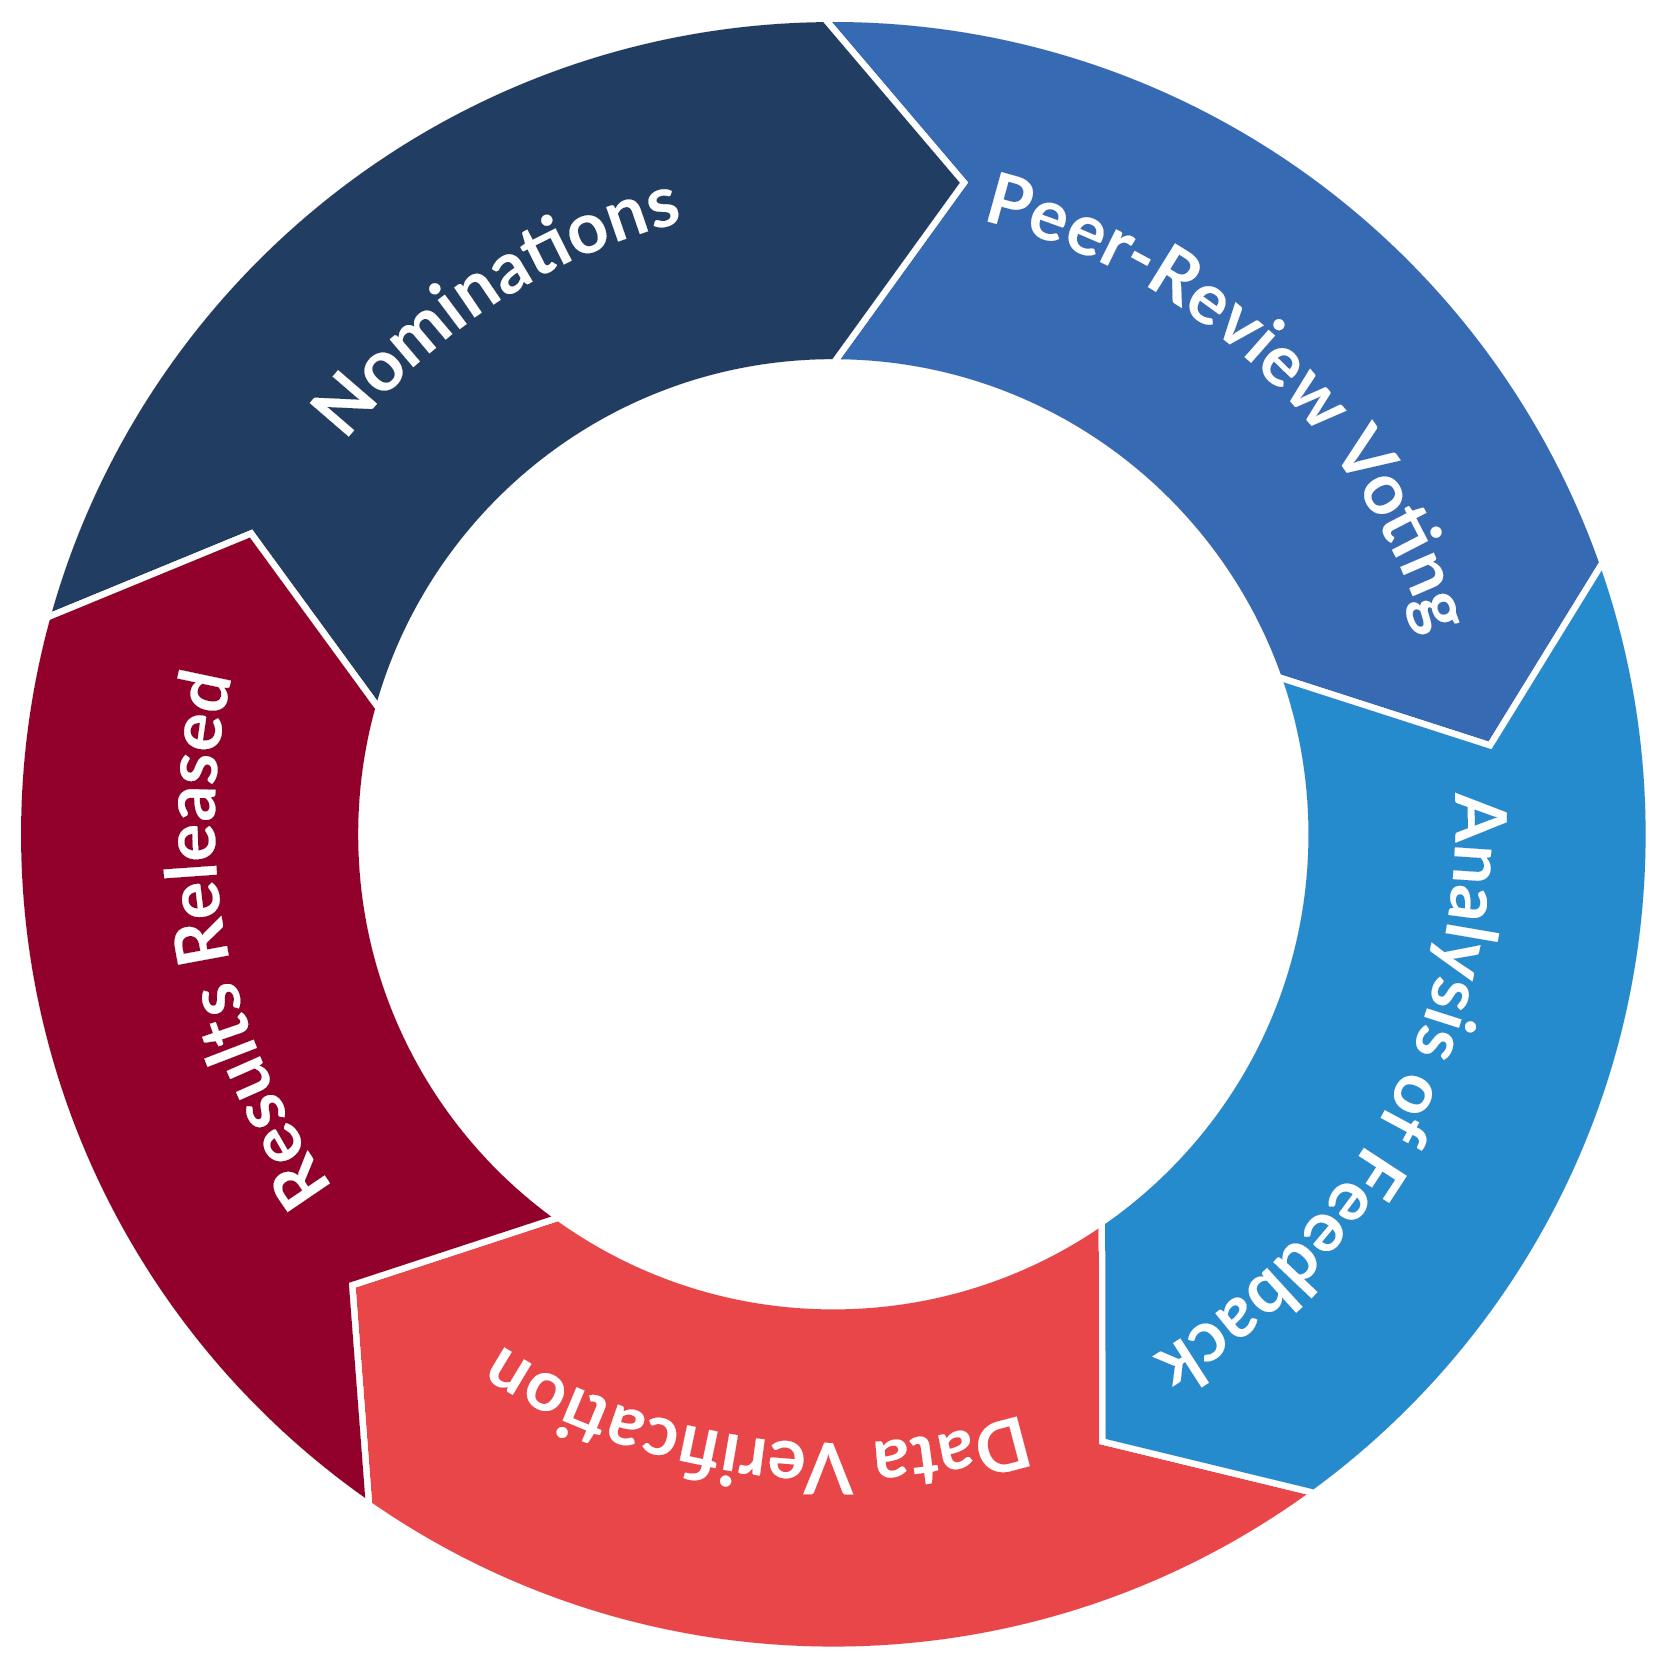 Methodology wheel